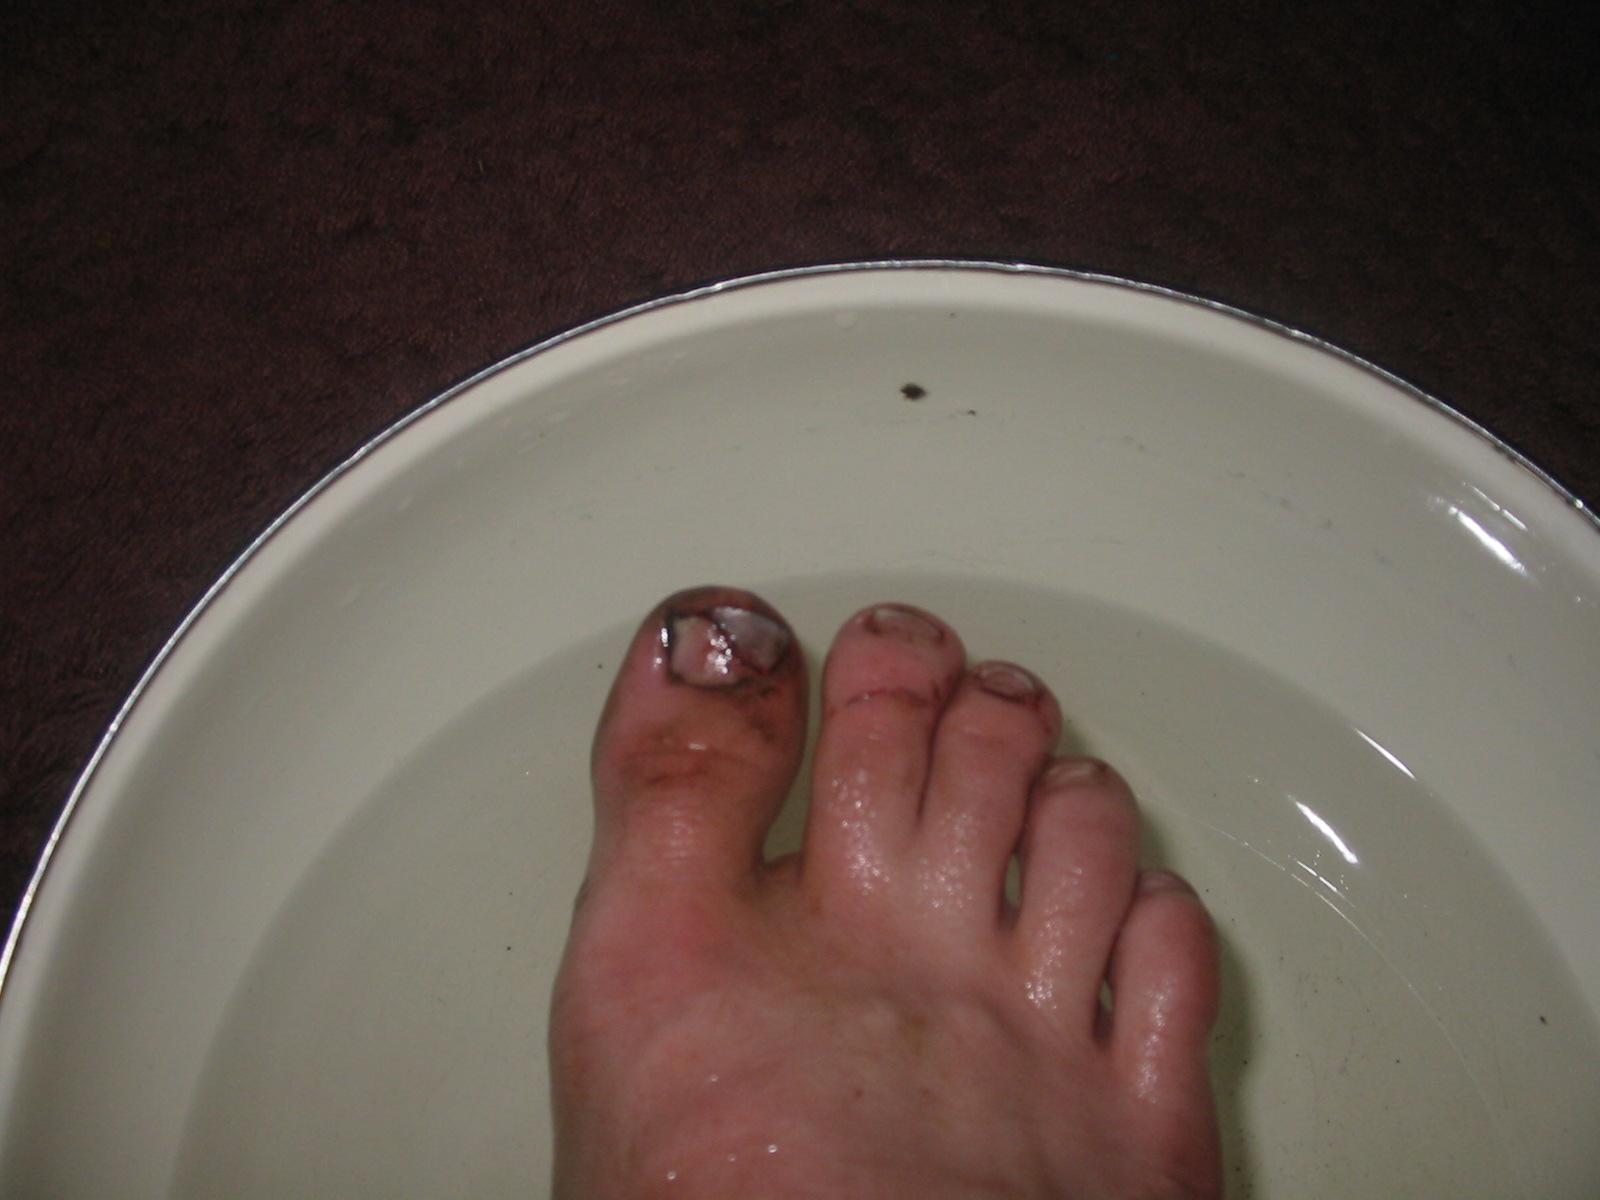 Disgusting Toenail Injury Part 2 - Picture | eBaum's World